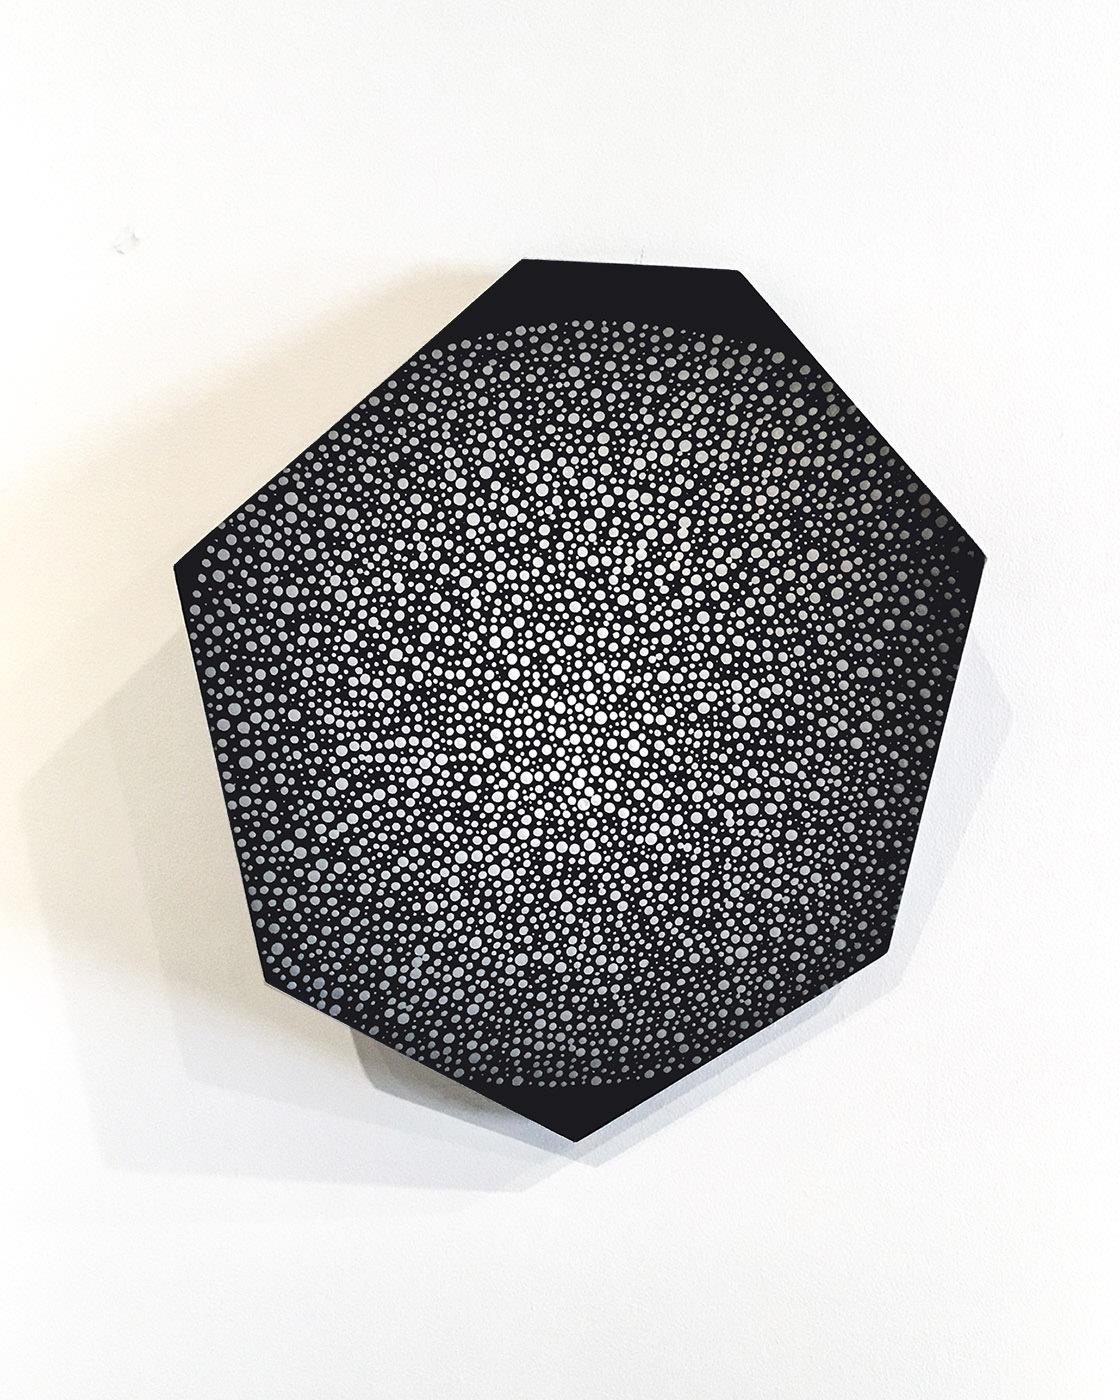 'Affinity', 2020 - AJ Oishi at Kostuik Gallery